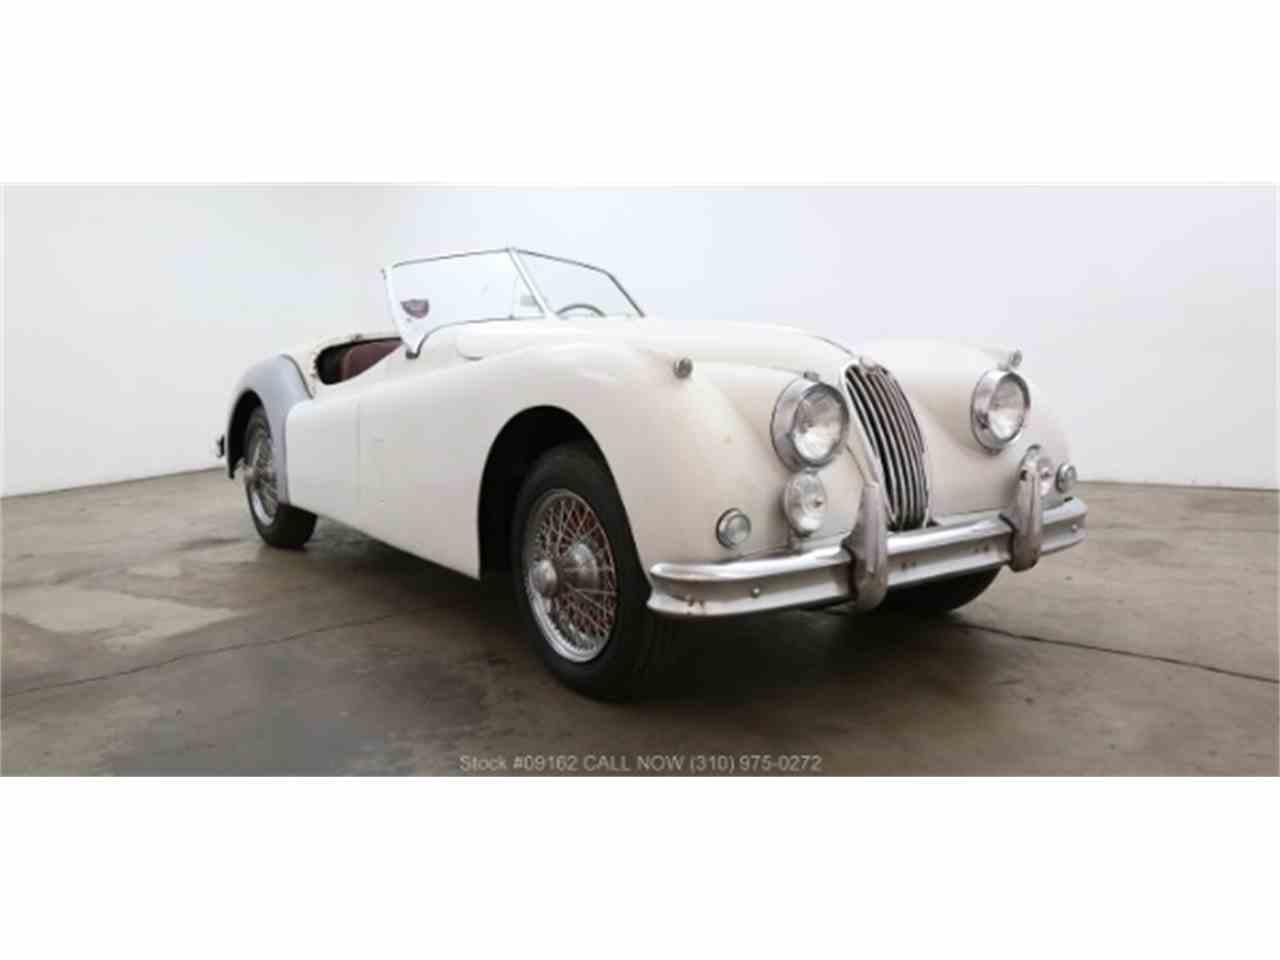 period jaguar sale cars classics competition adea for jd roadster